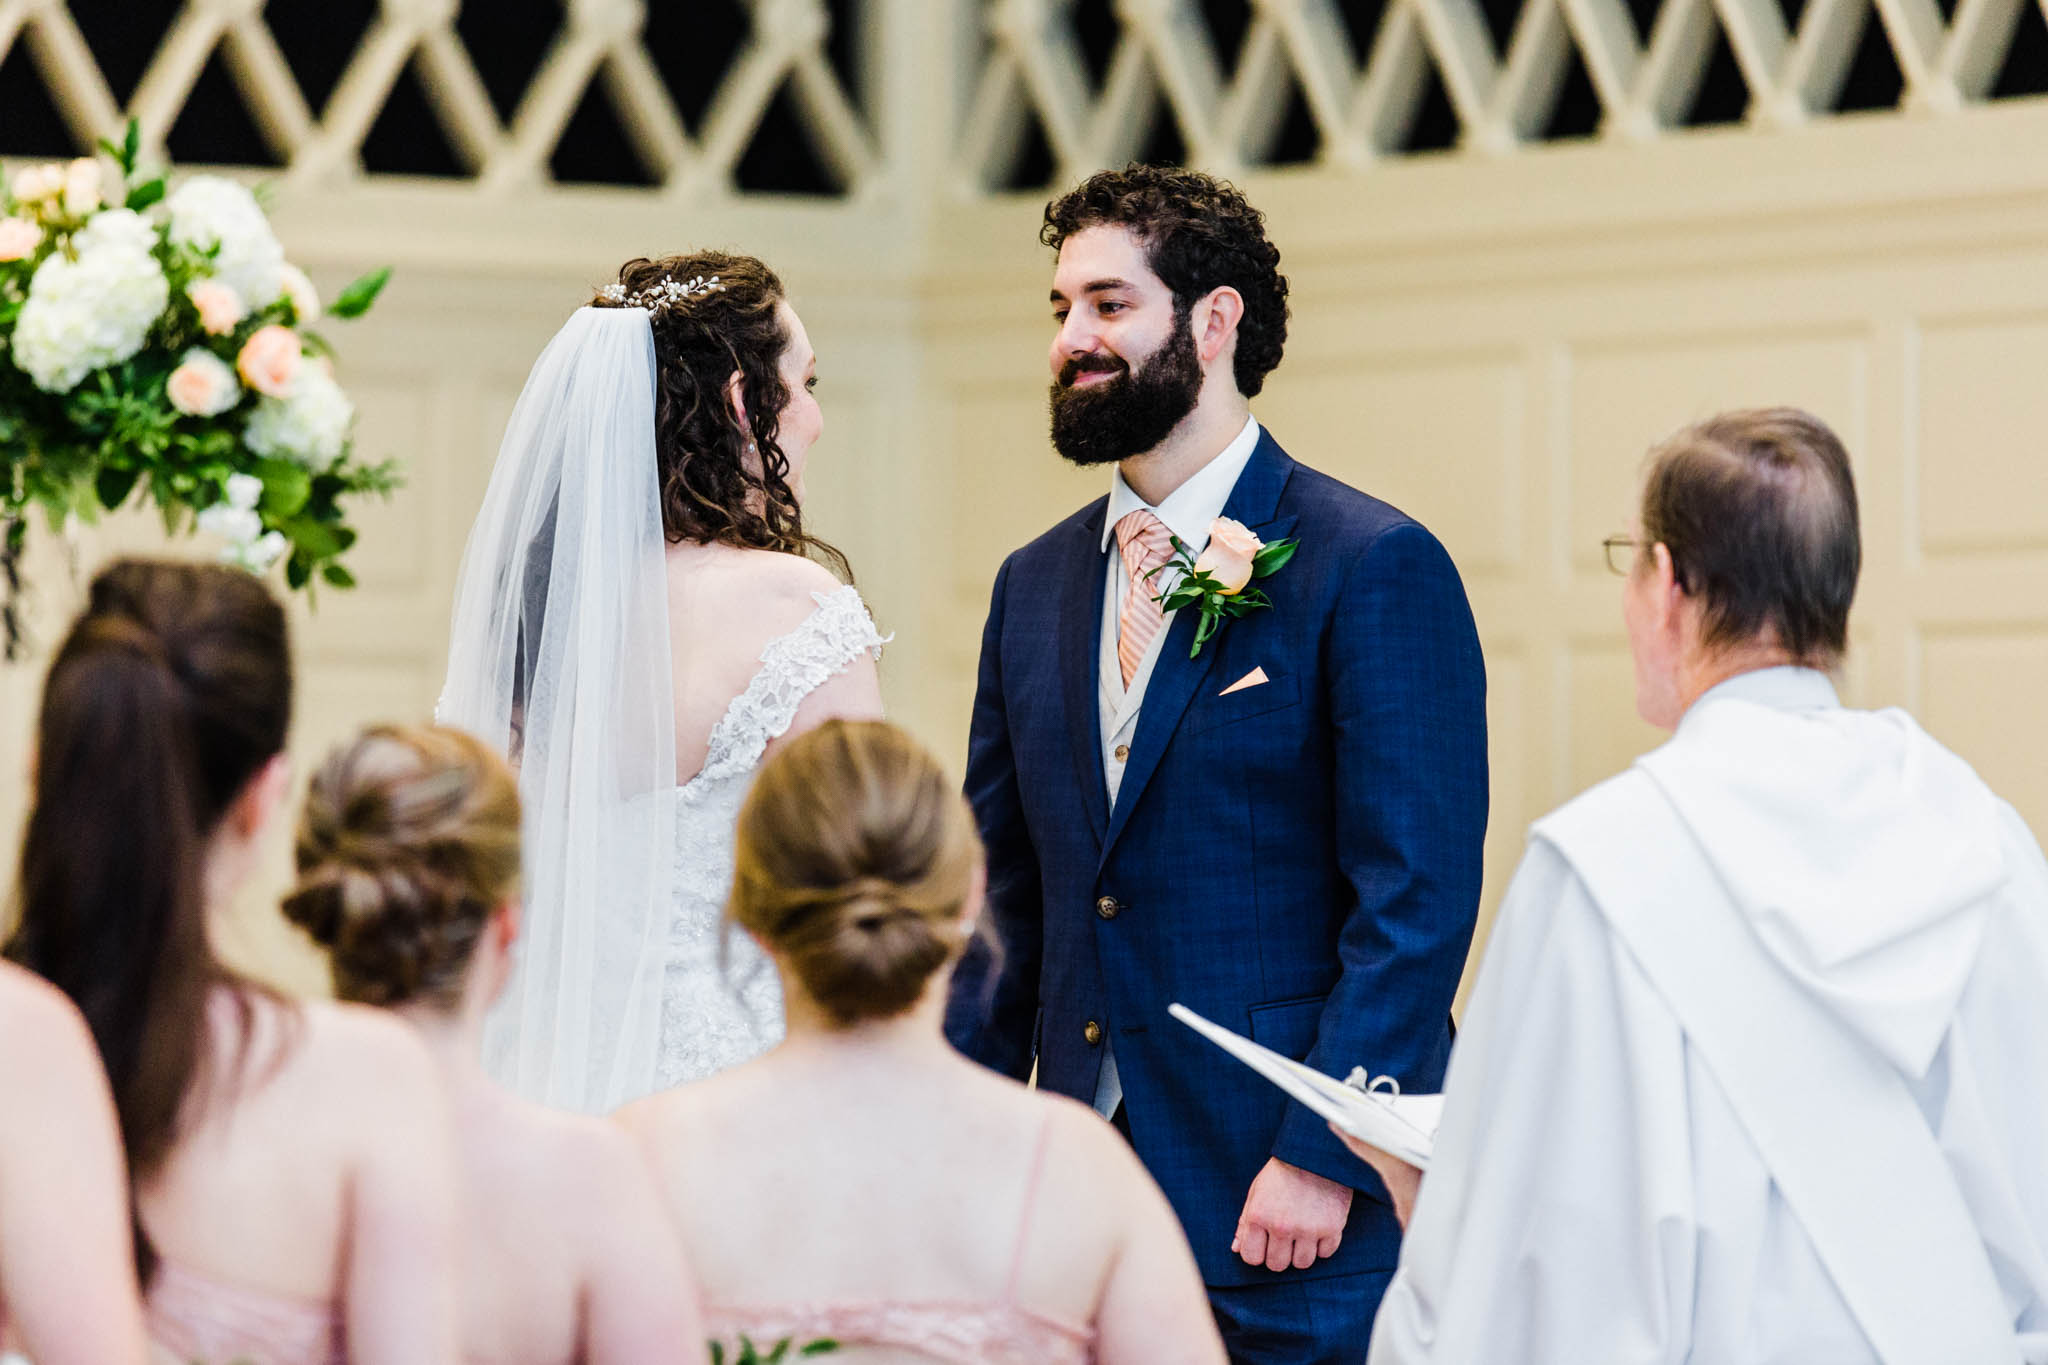 lynchburg-virginia-wedding-photographer-114.jpg